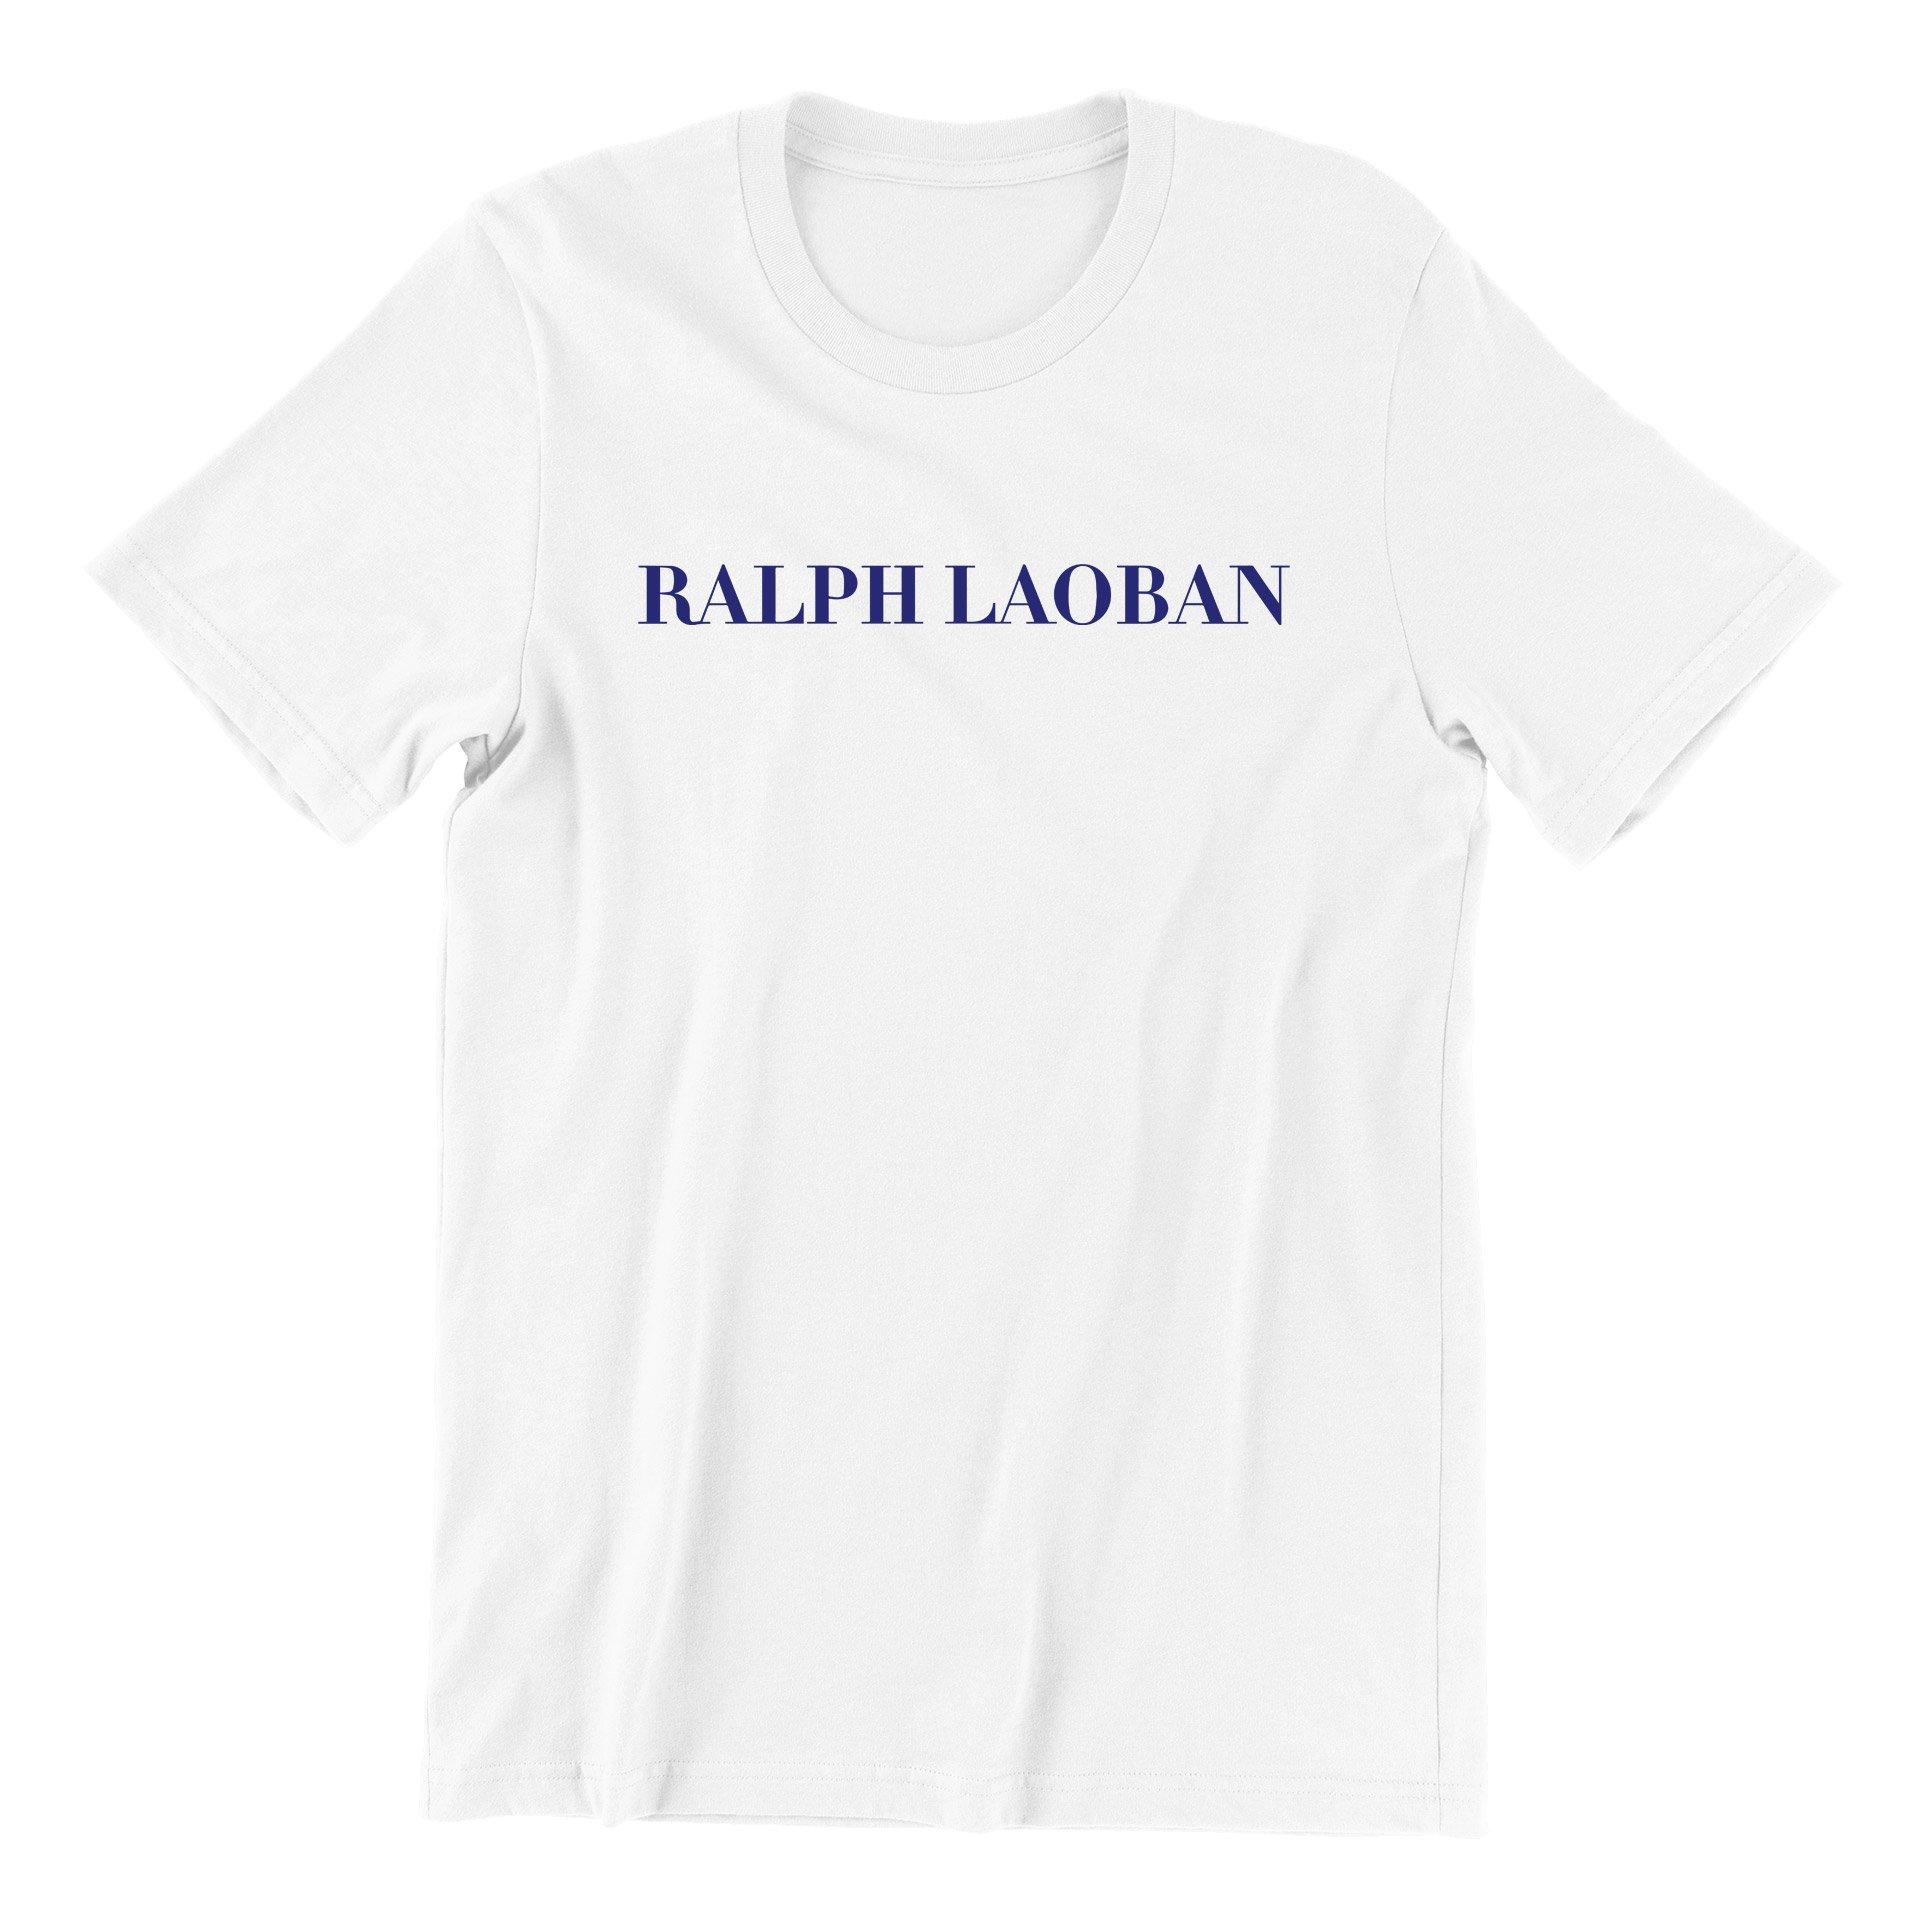 Ralph Laoban Crew Neck S-Sleeve T-shirt